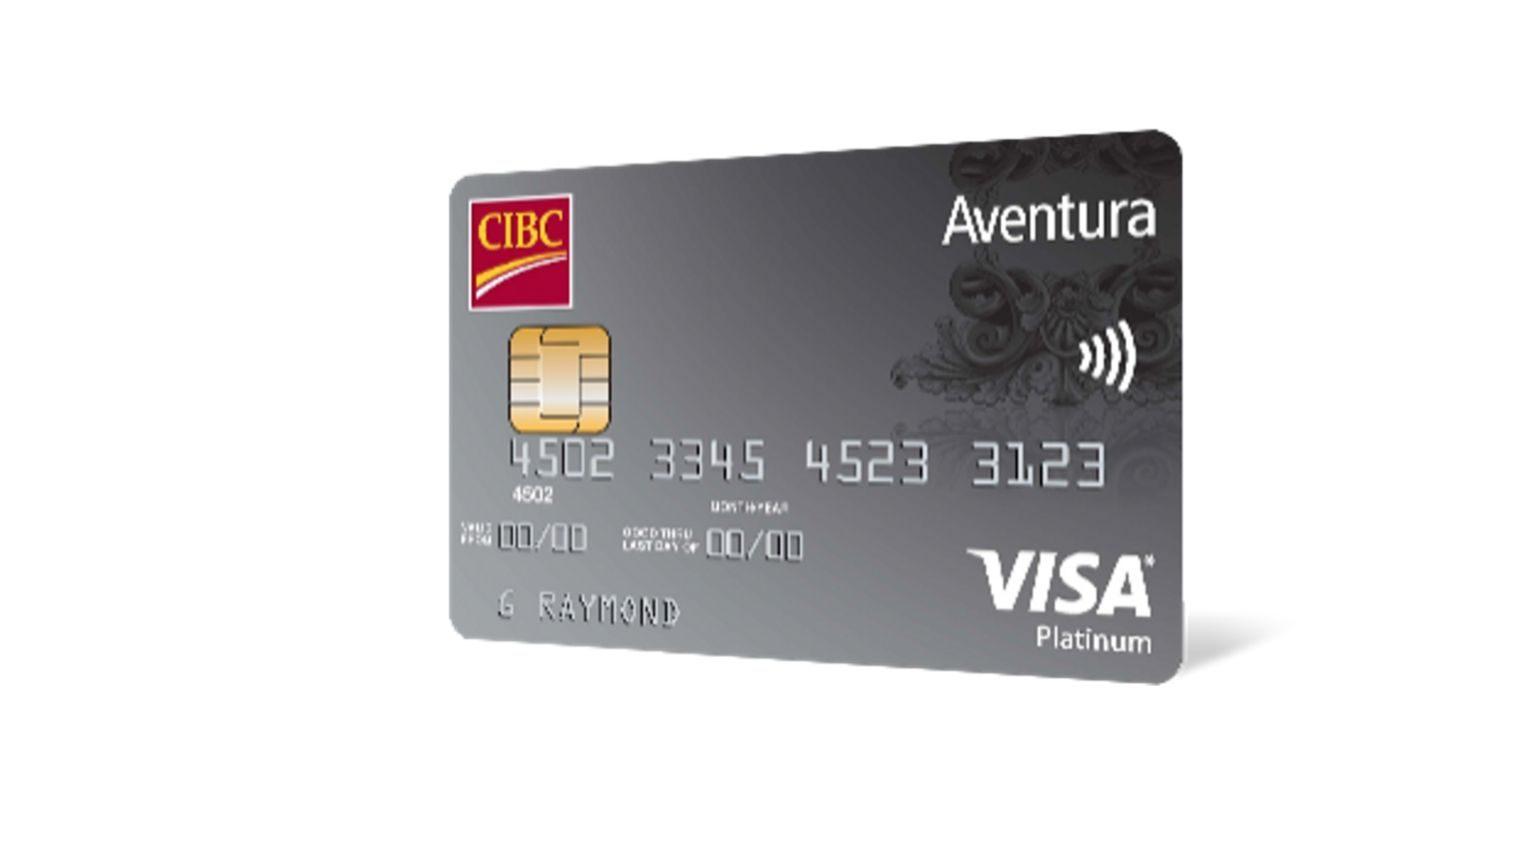 Aventura credit cards